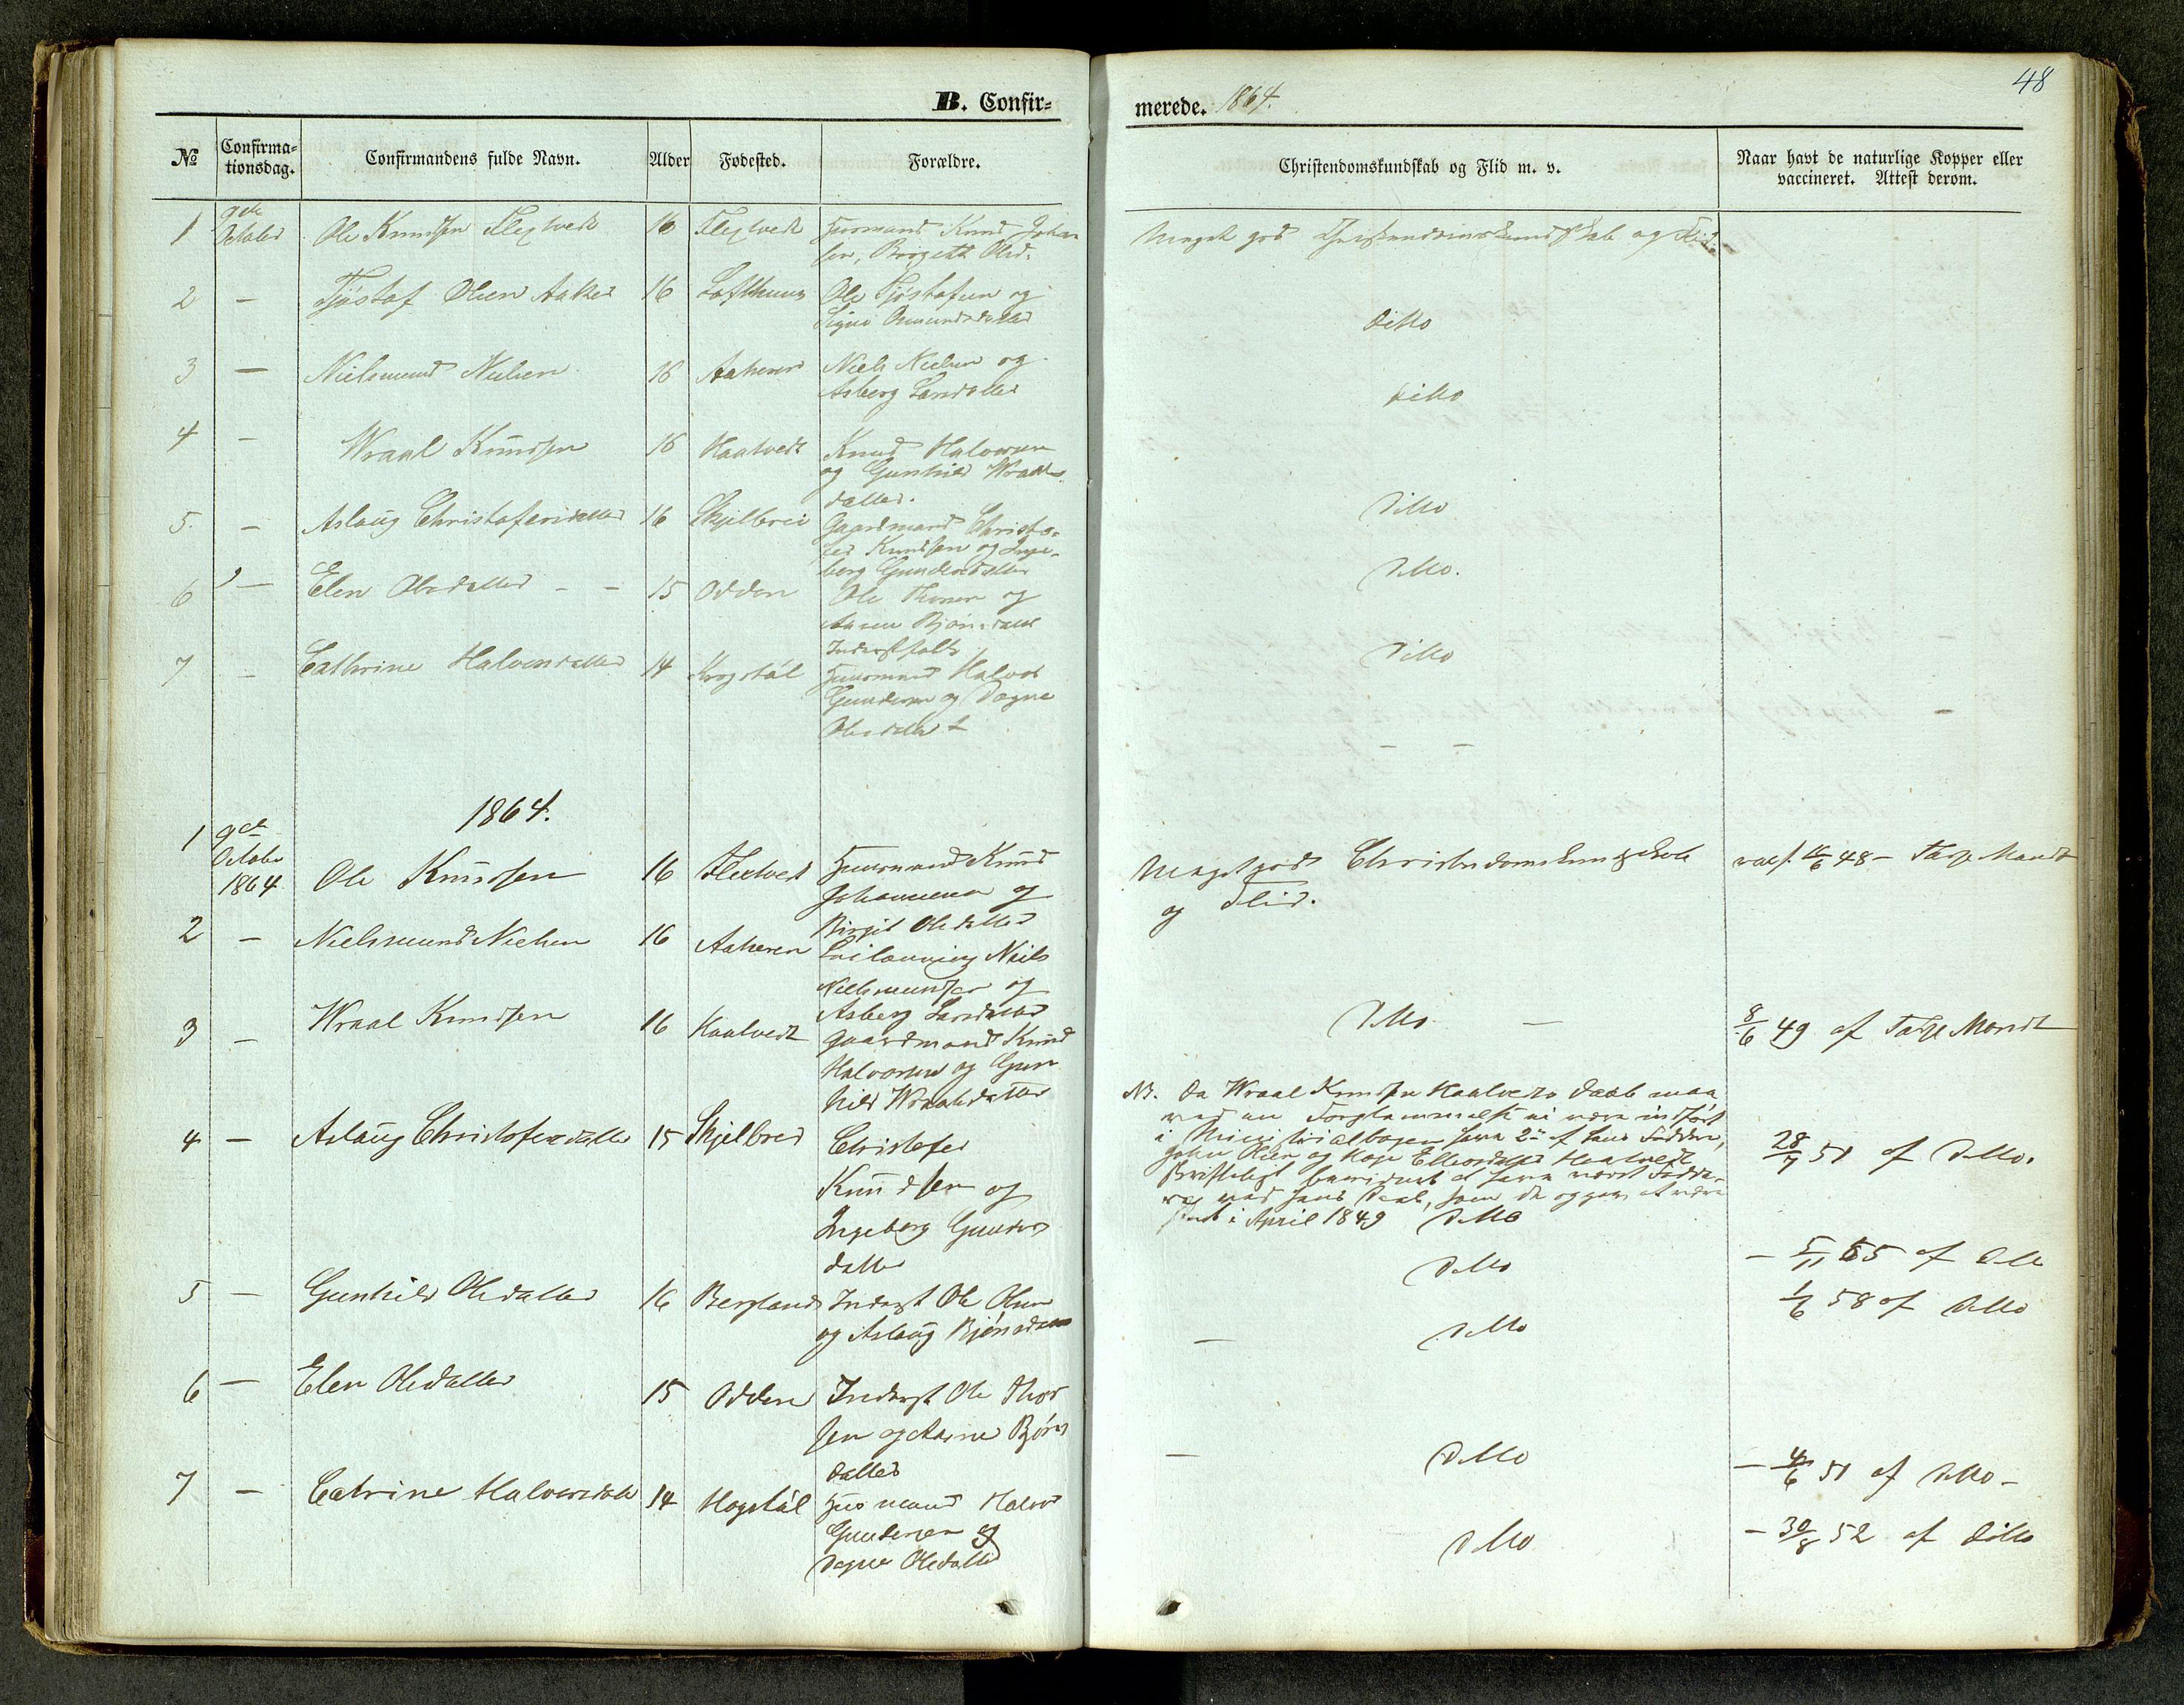 SAKO, Lårdal kirkebøker, G/Ga/L0002: Klokkerbok nr. I 2, 1861-1890, s. 48